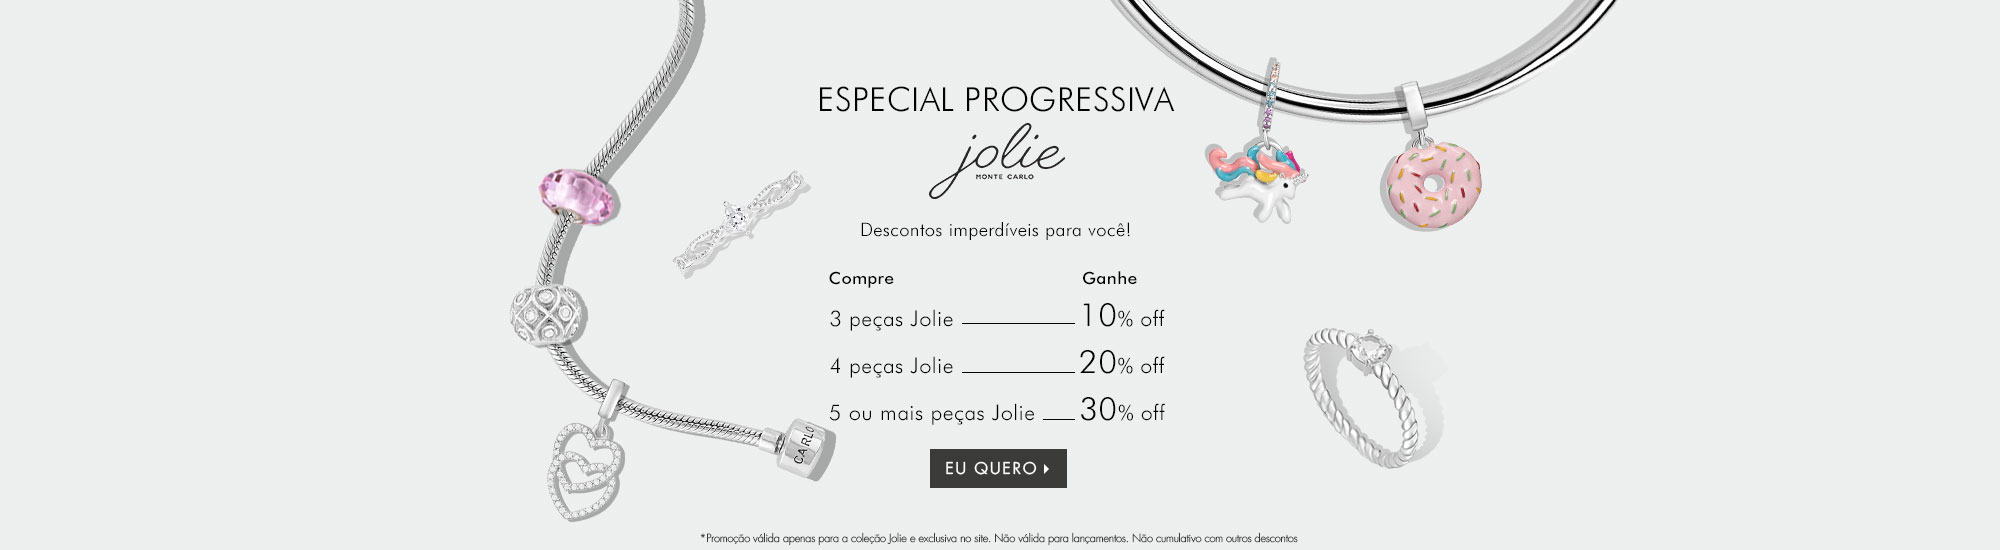 Jolie promo